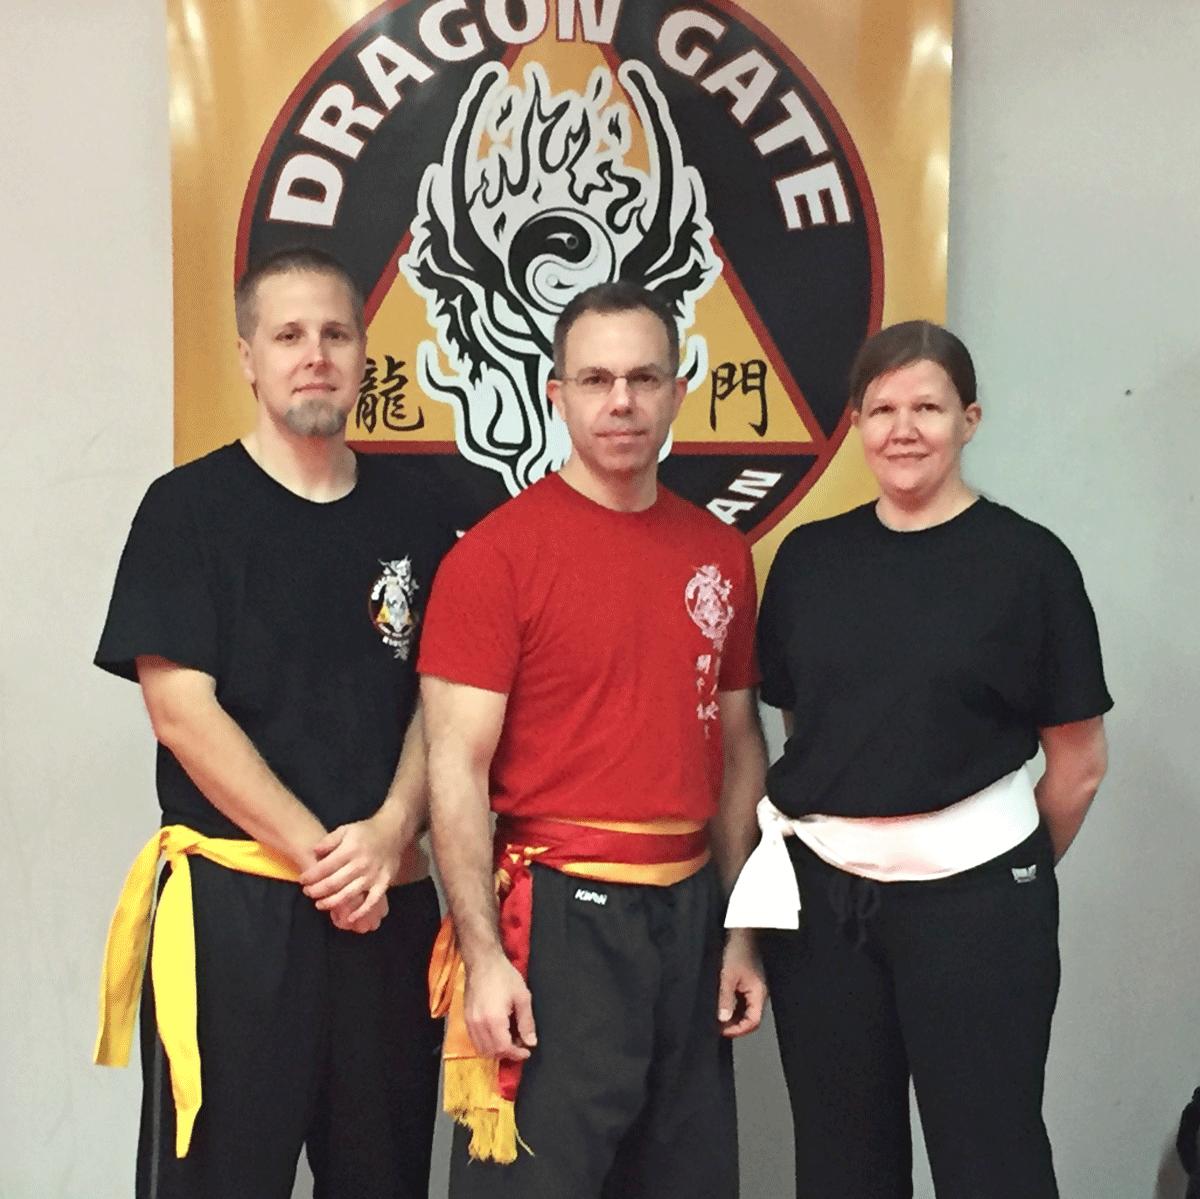 Kreg Howk, Shifu Eric LEcuyer and Lisa Vigeant